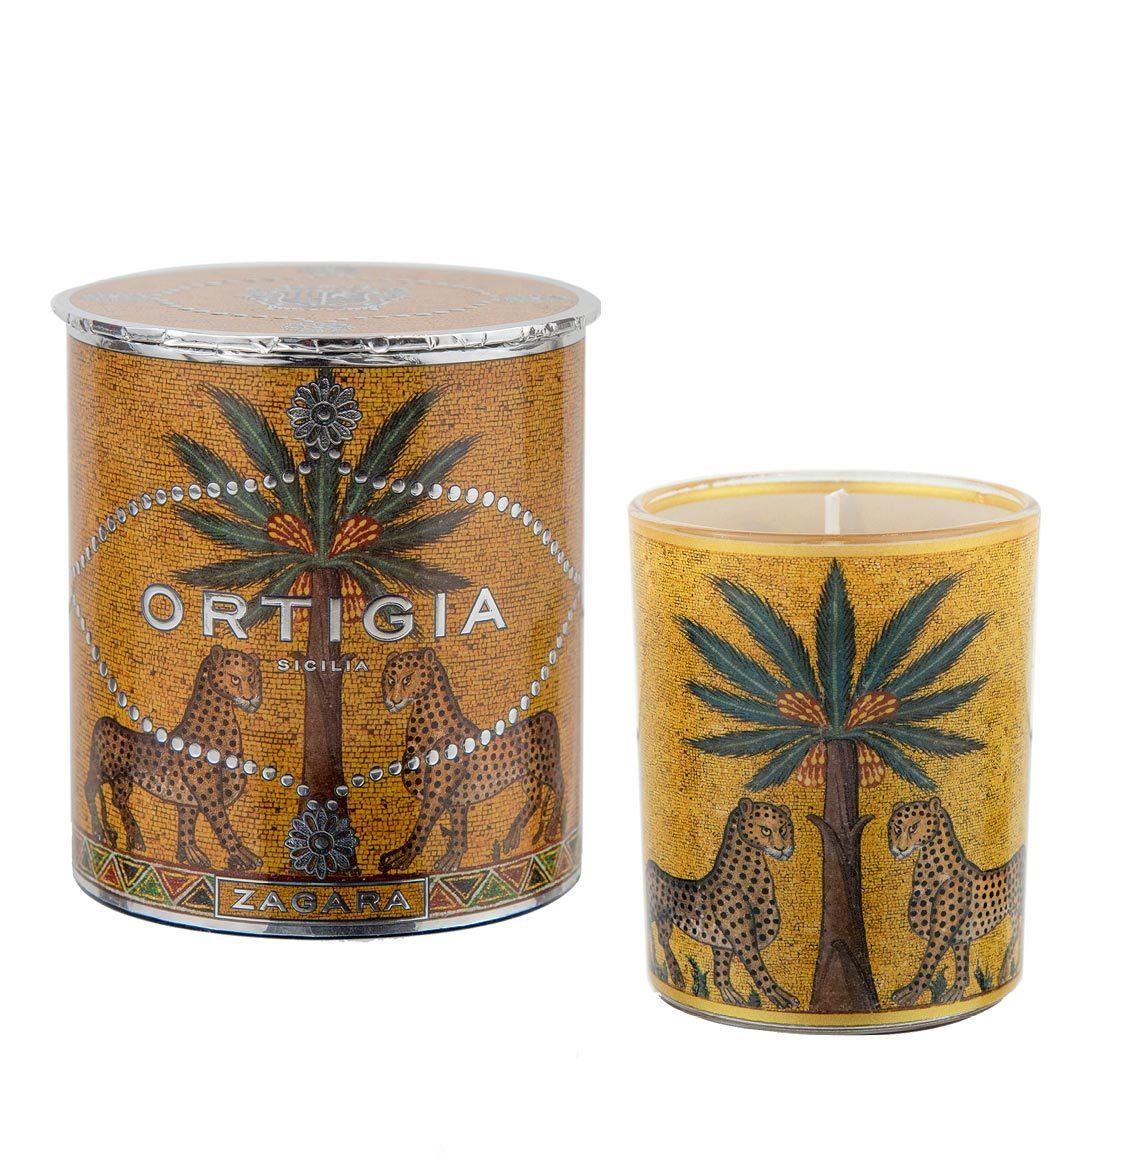 Ortigia Sicilia Orange Blossom Decorated Candle 150g